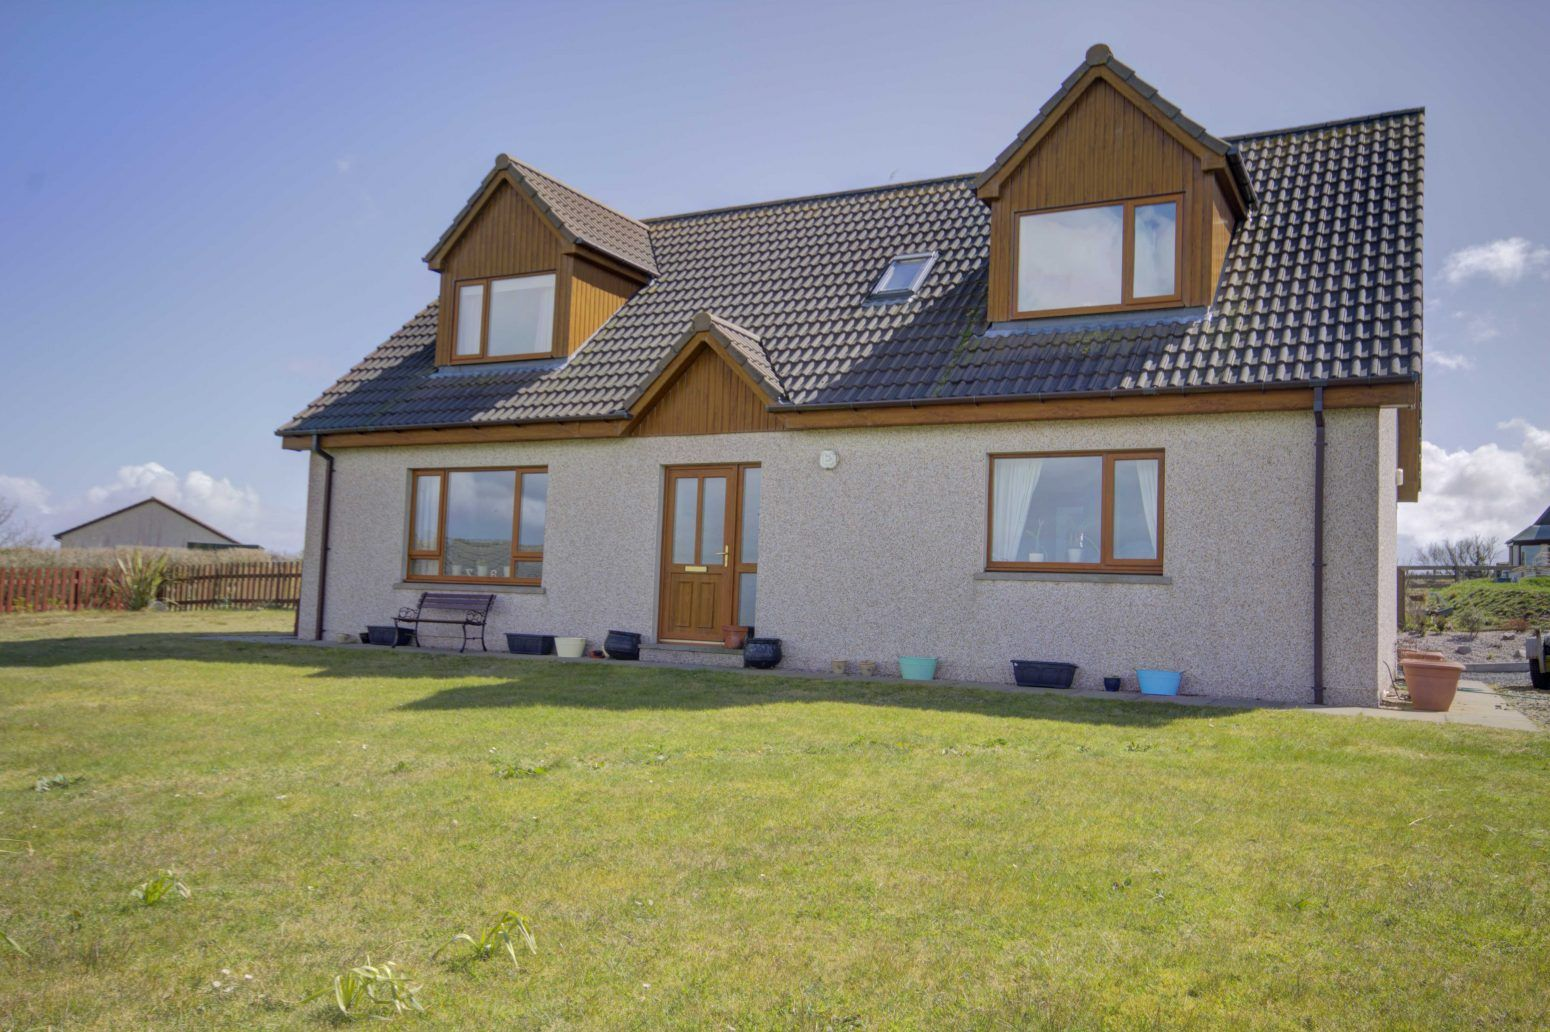 Property photo 1 of 31.